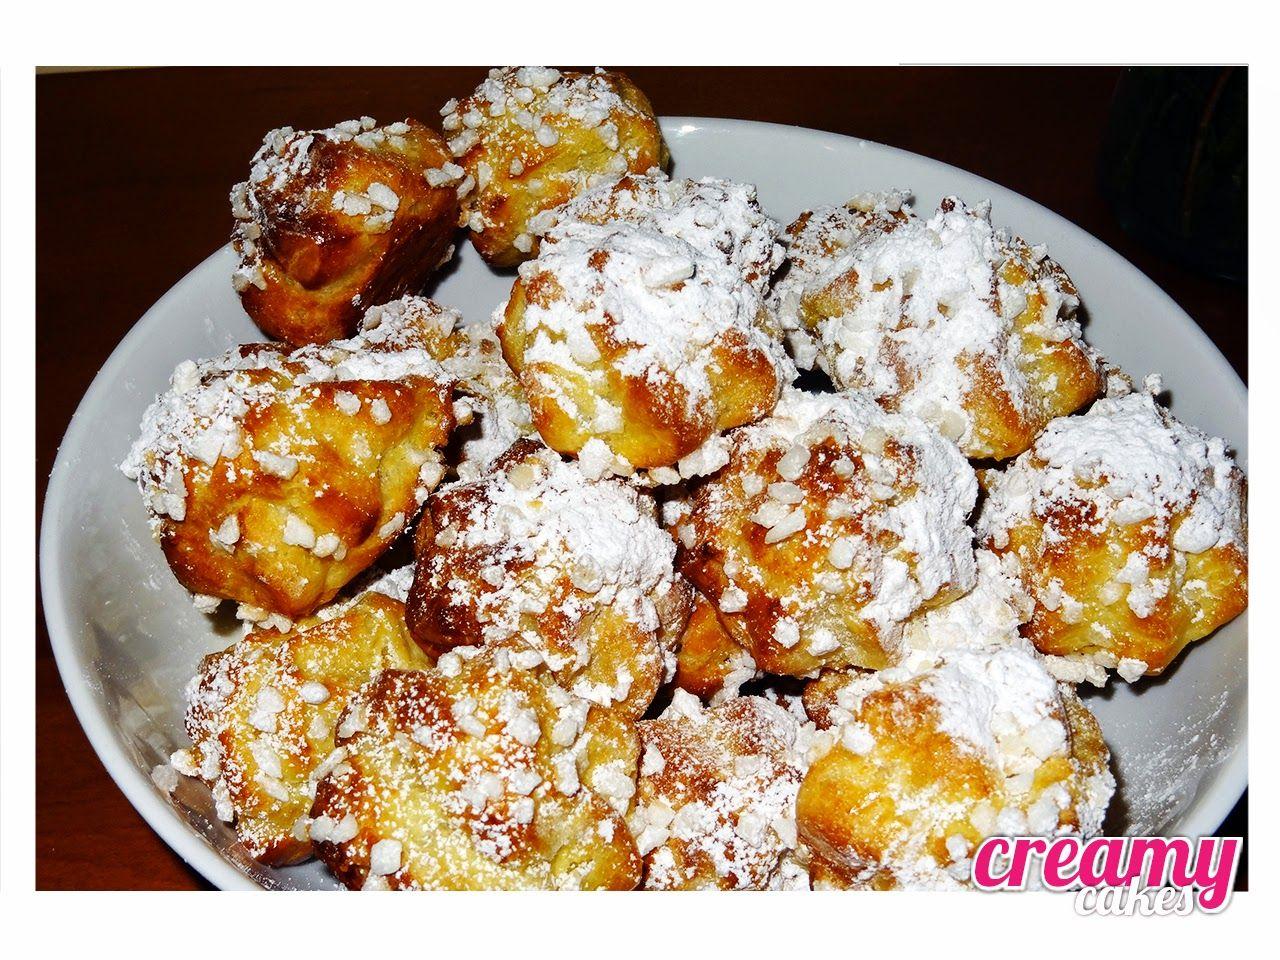 Creamy Cakes: Chouquettes